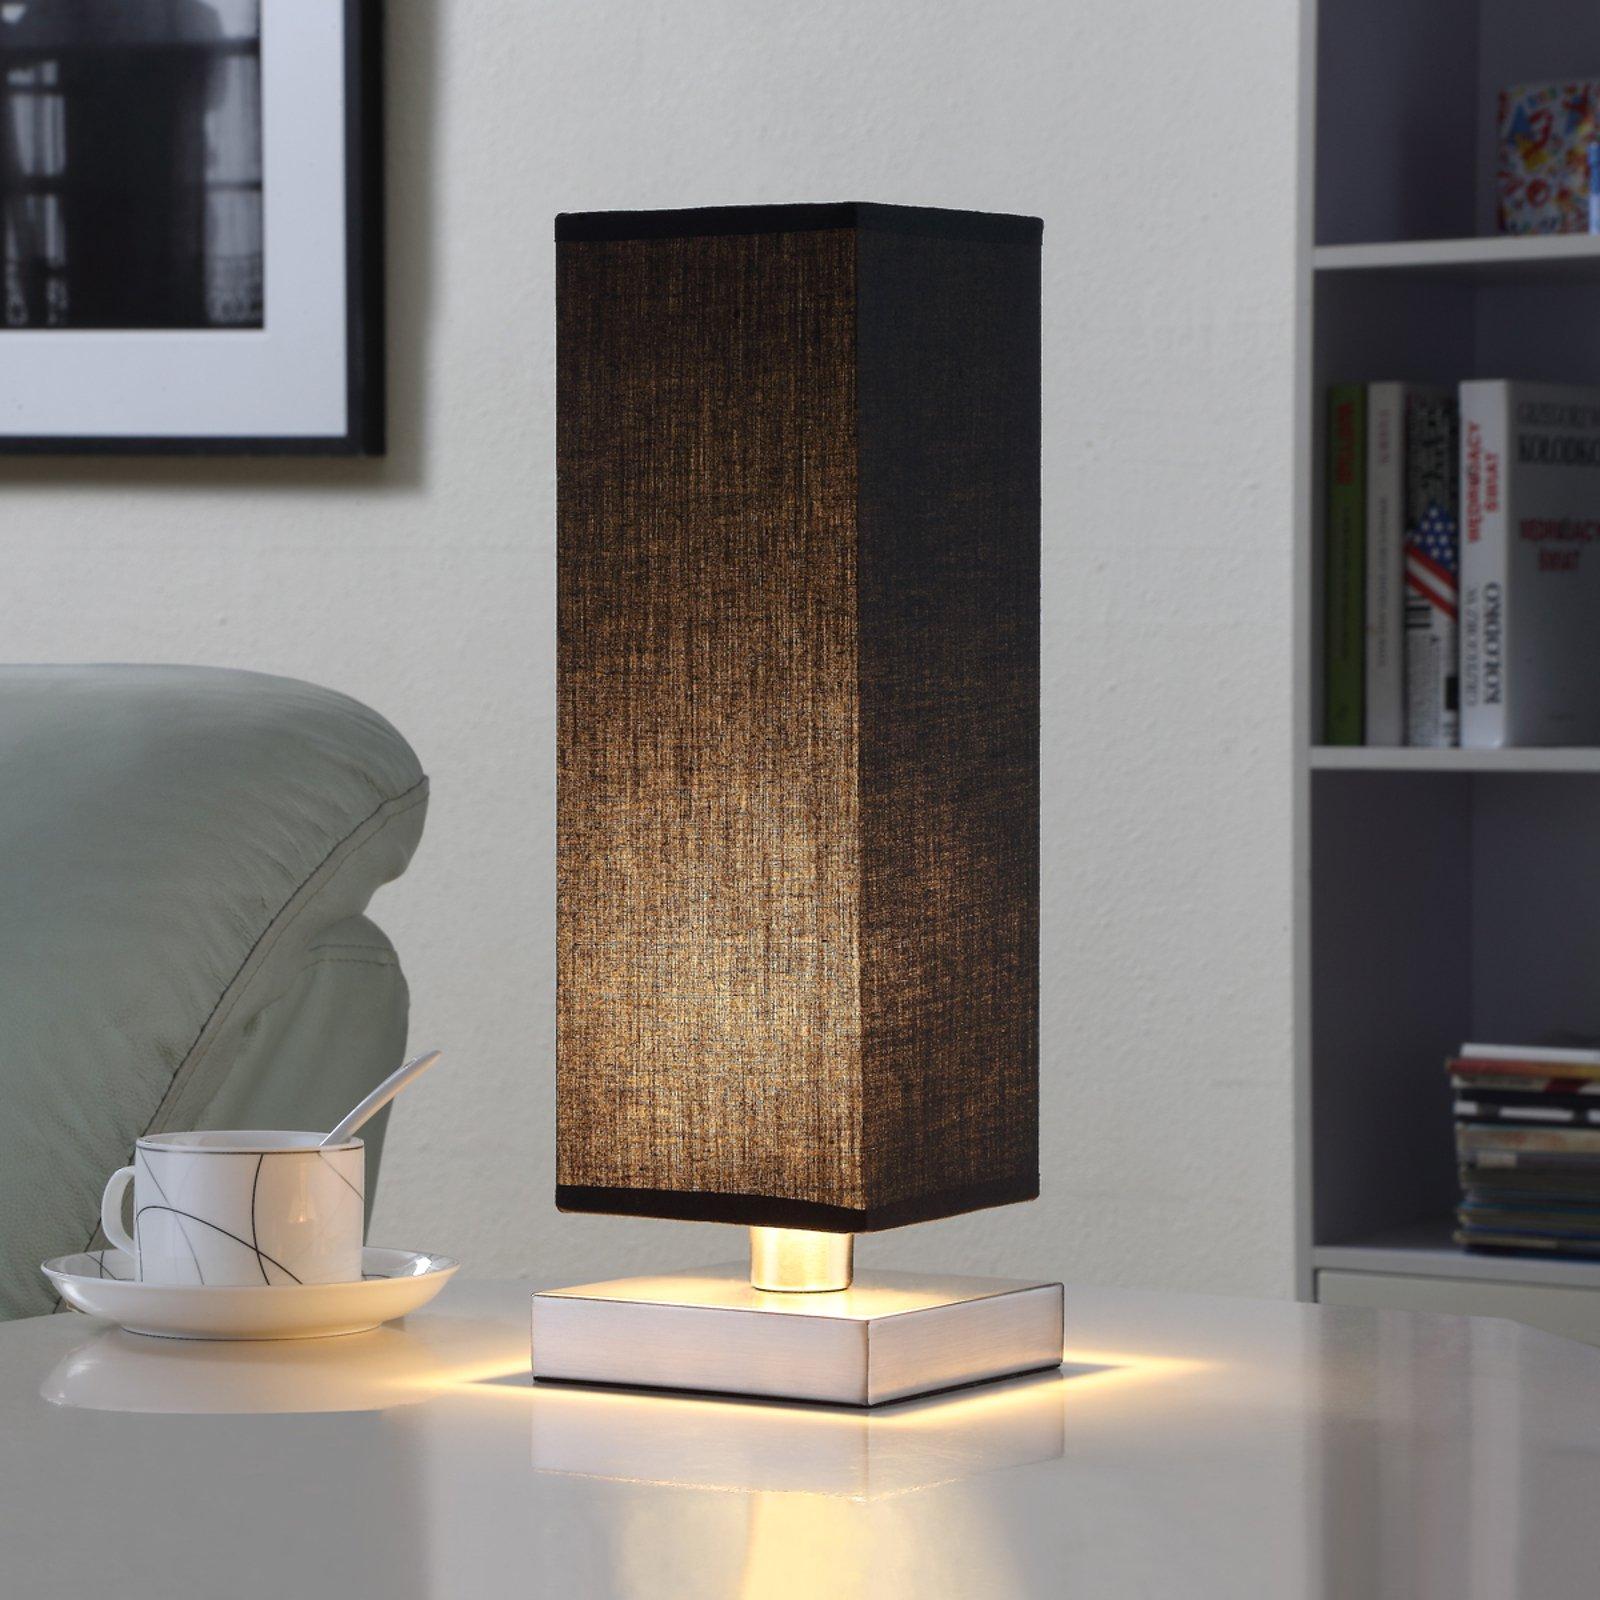 Svart tekstilbordlampe Martje m. LED-pære